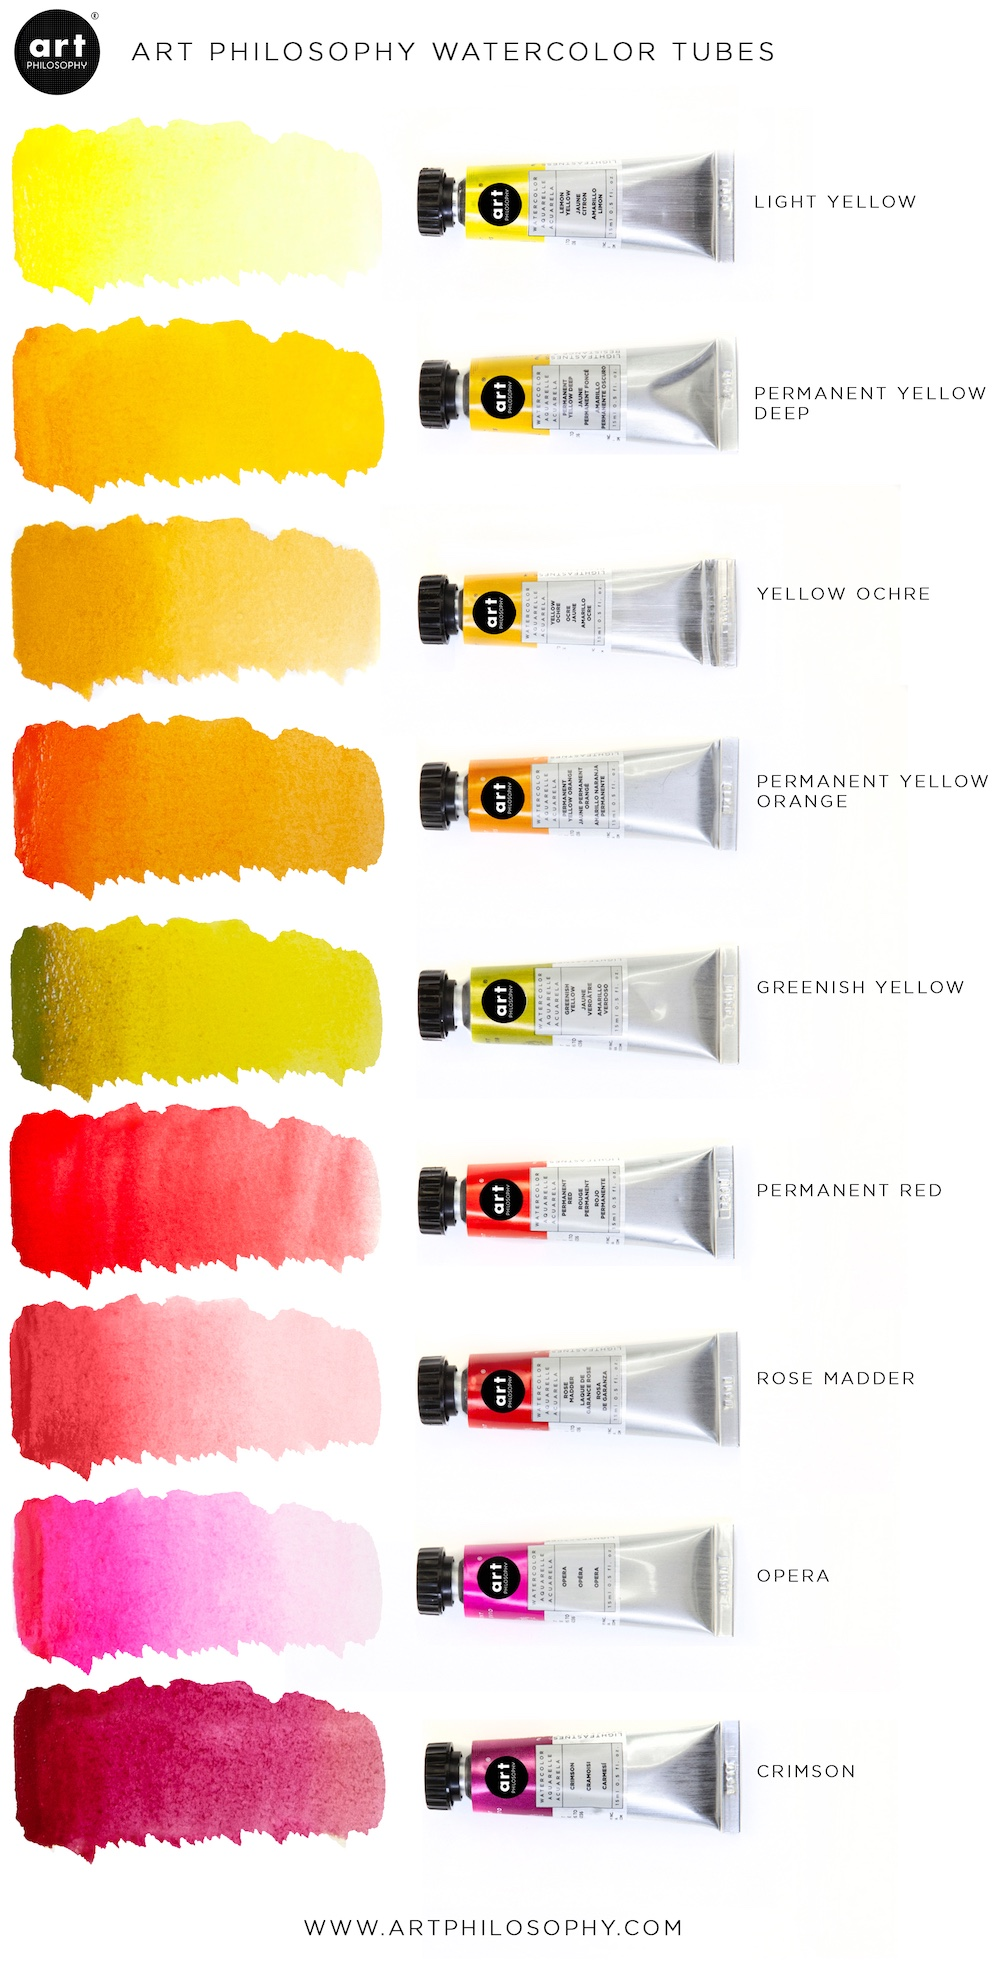 Art Philosophy® Artist Grade Watercolor Tubes - Greenish Yellow